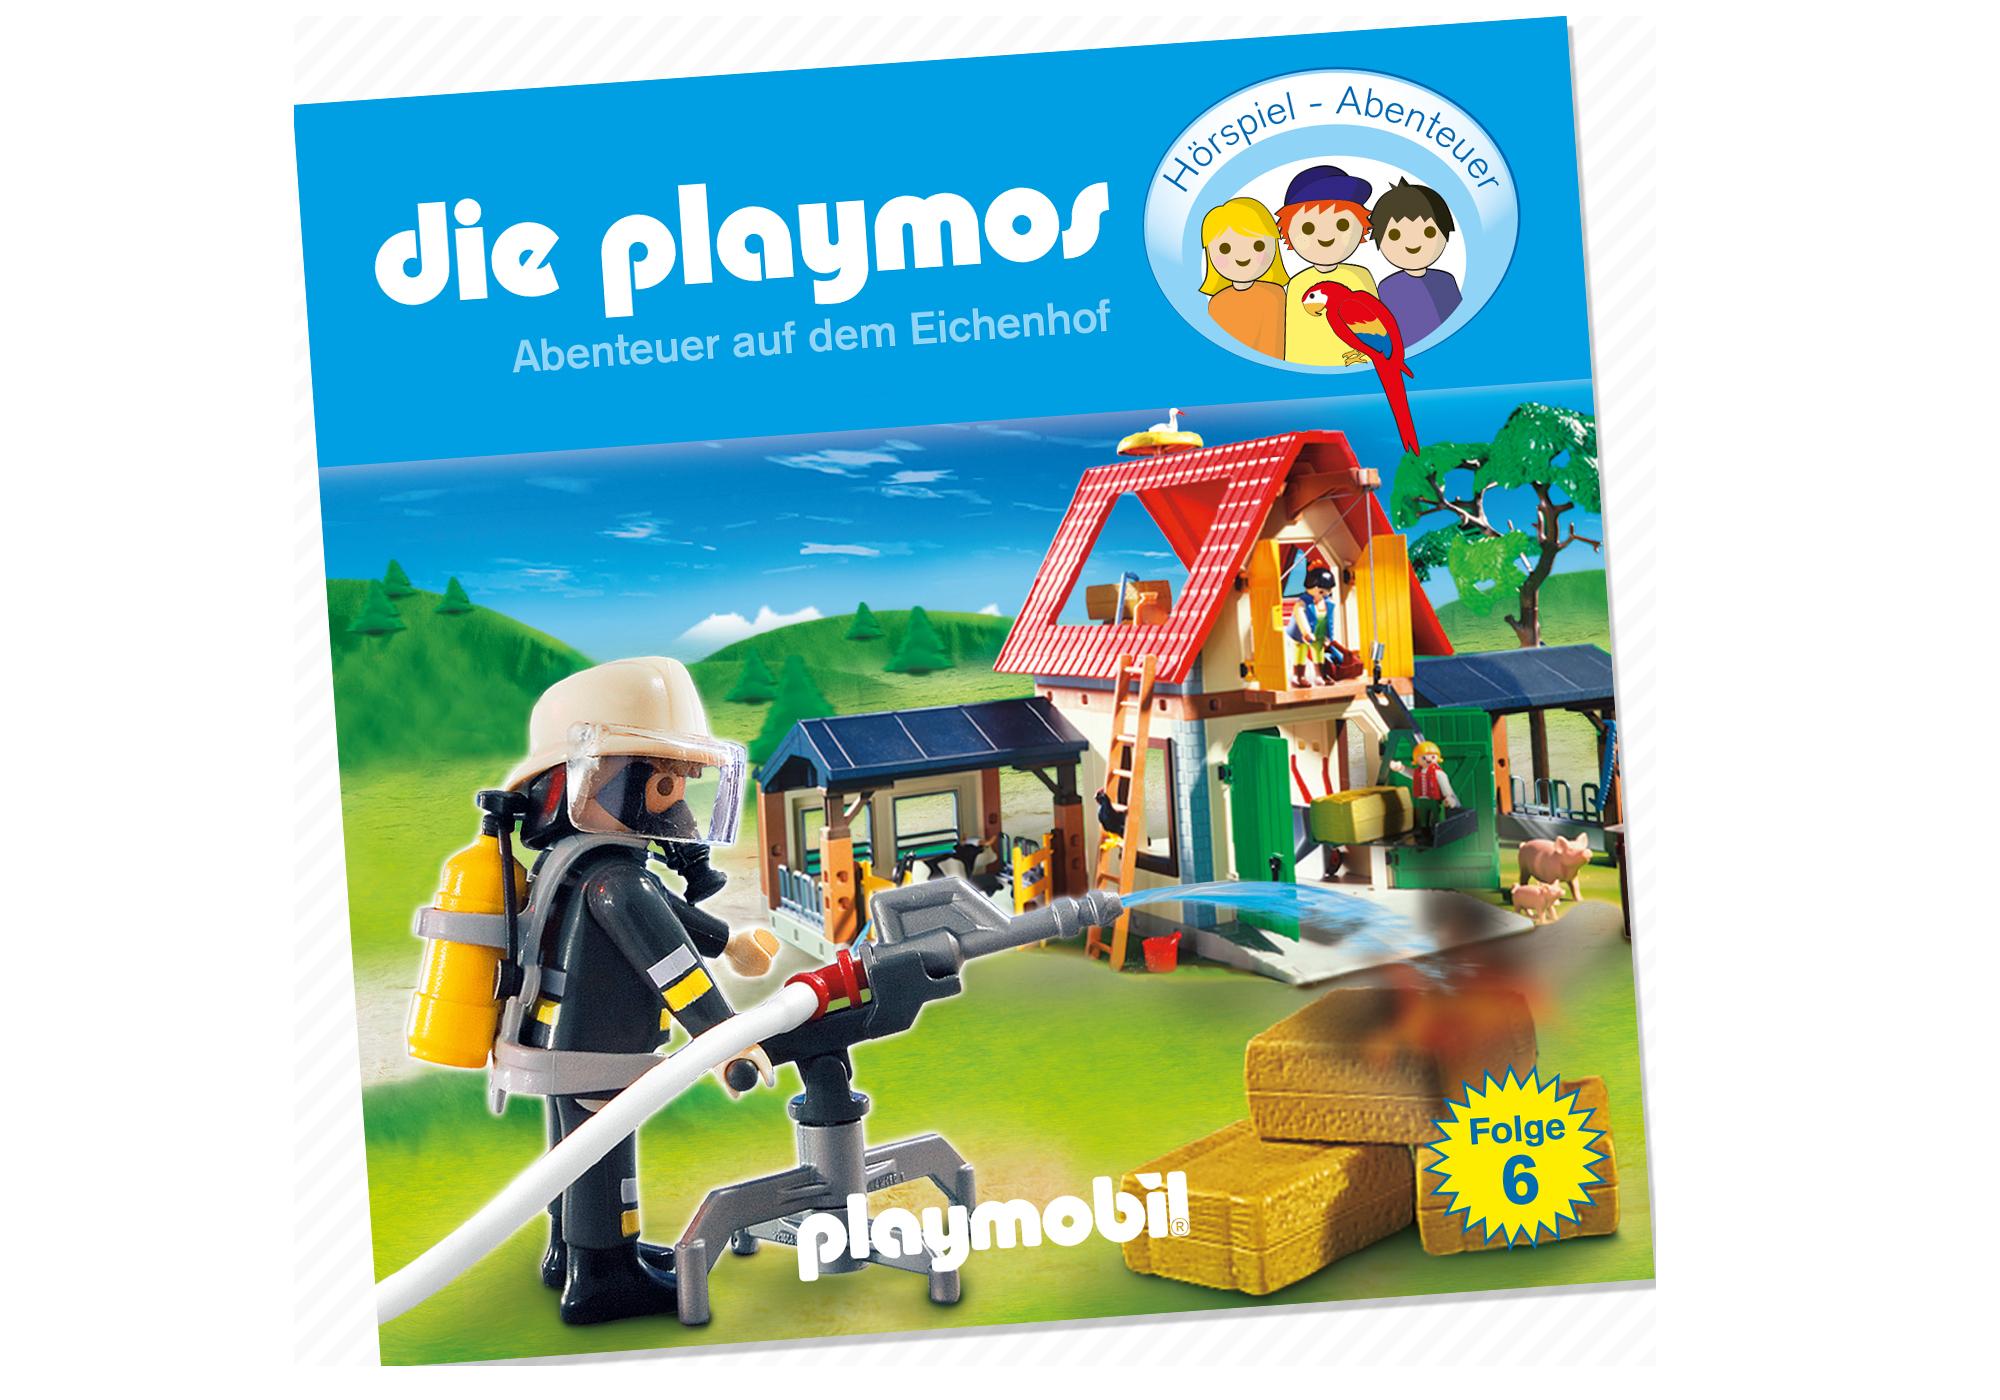 http://media.playmobil.com/i/playmobil/80159_product_detail